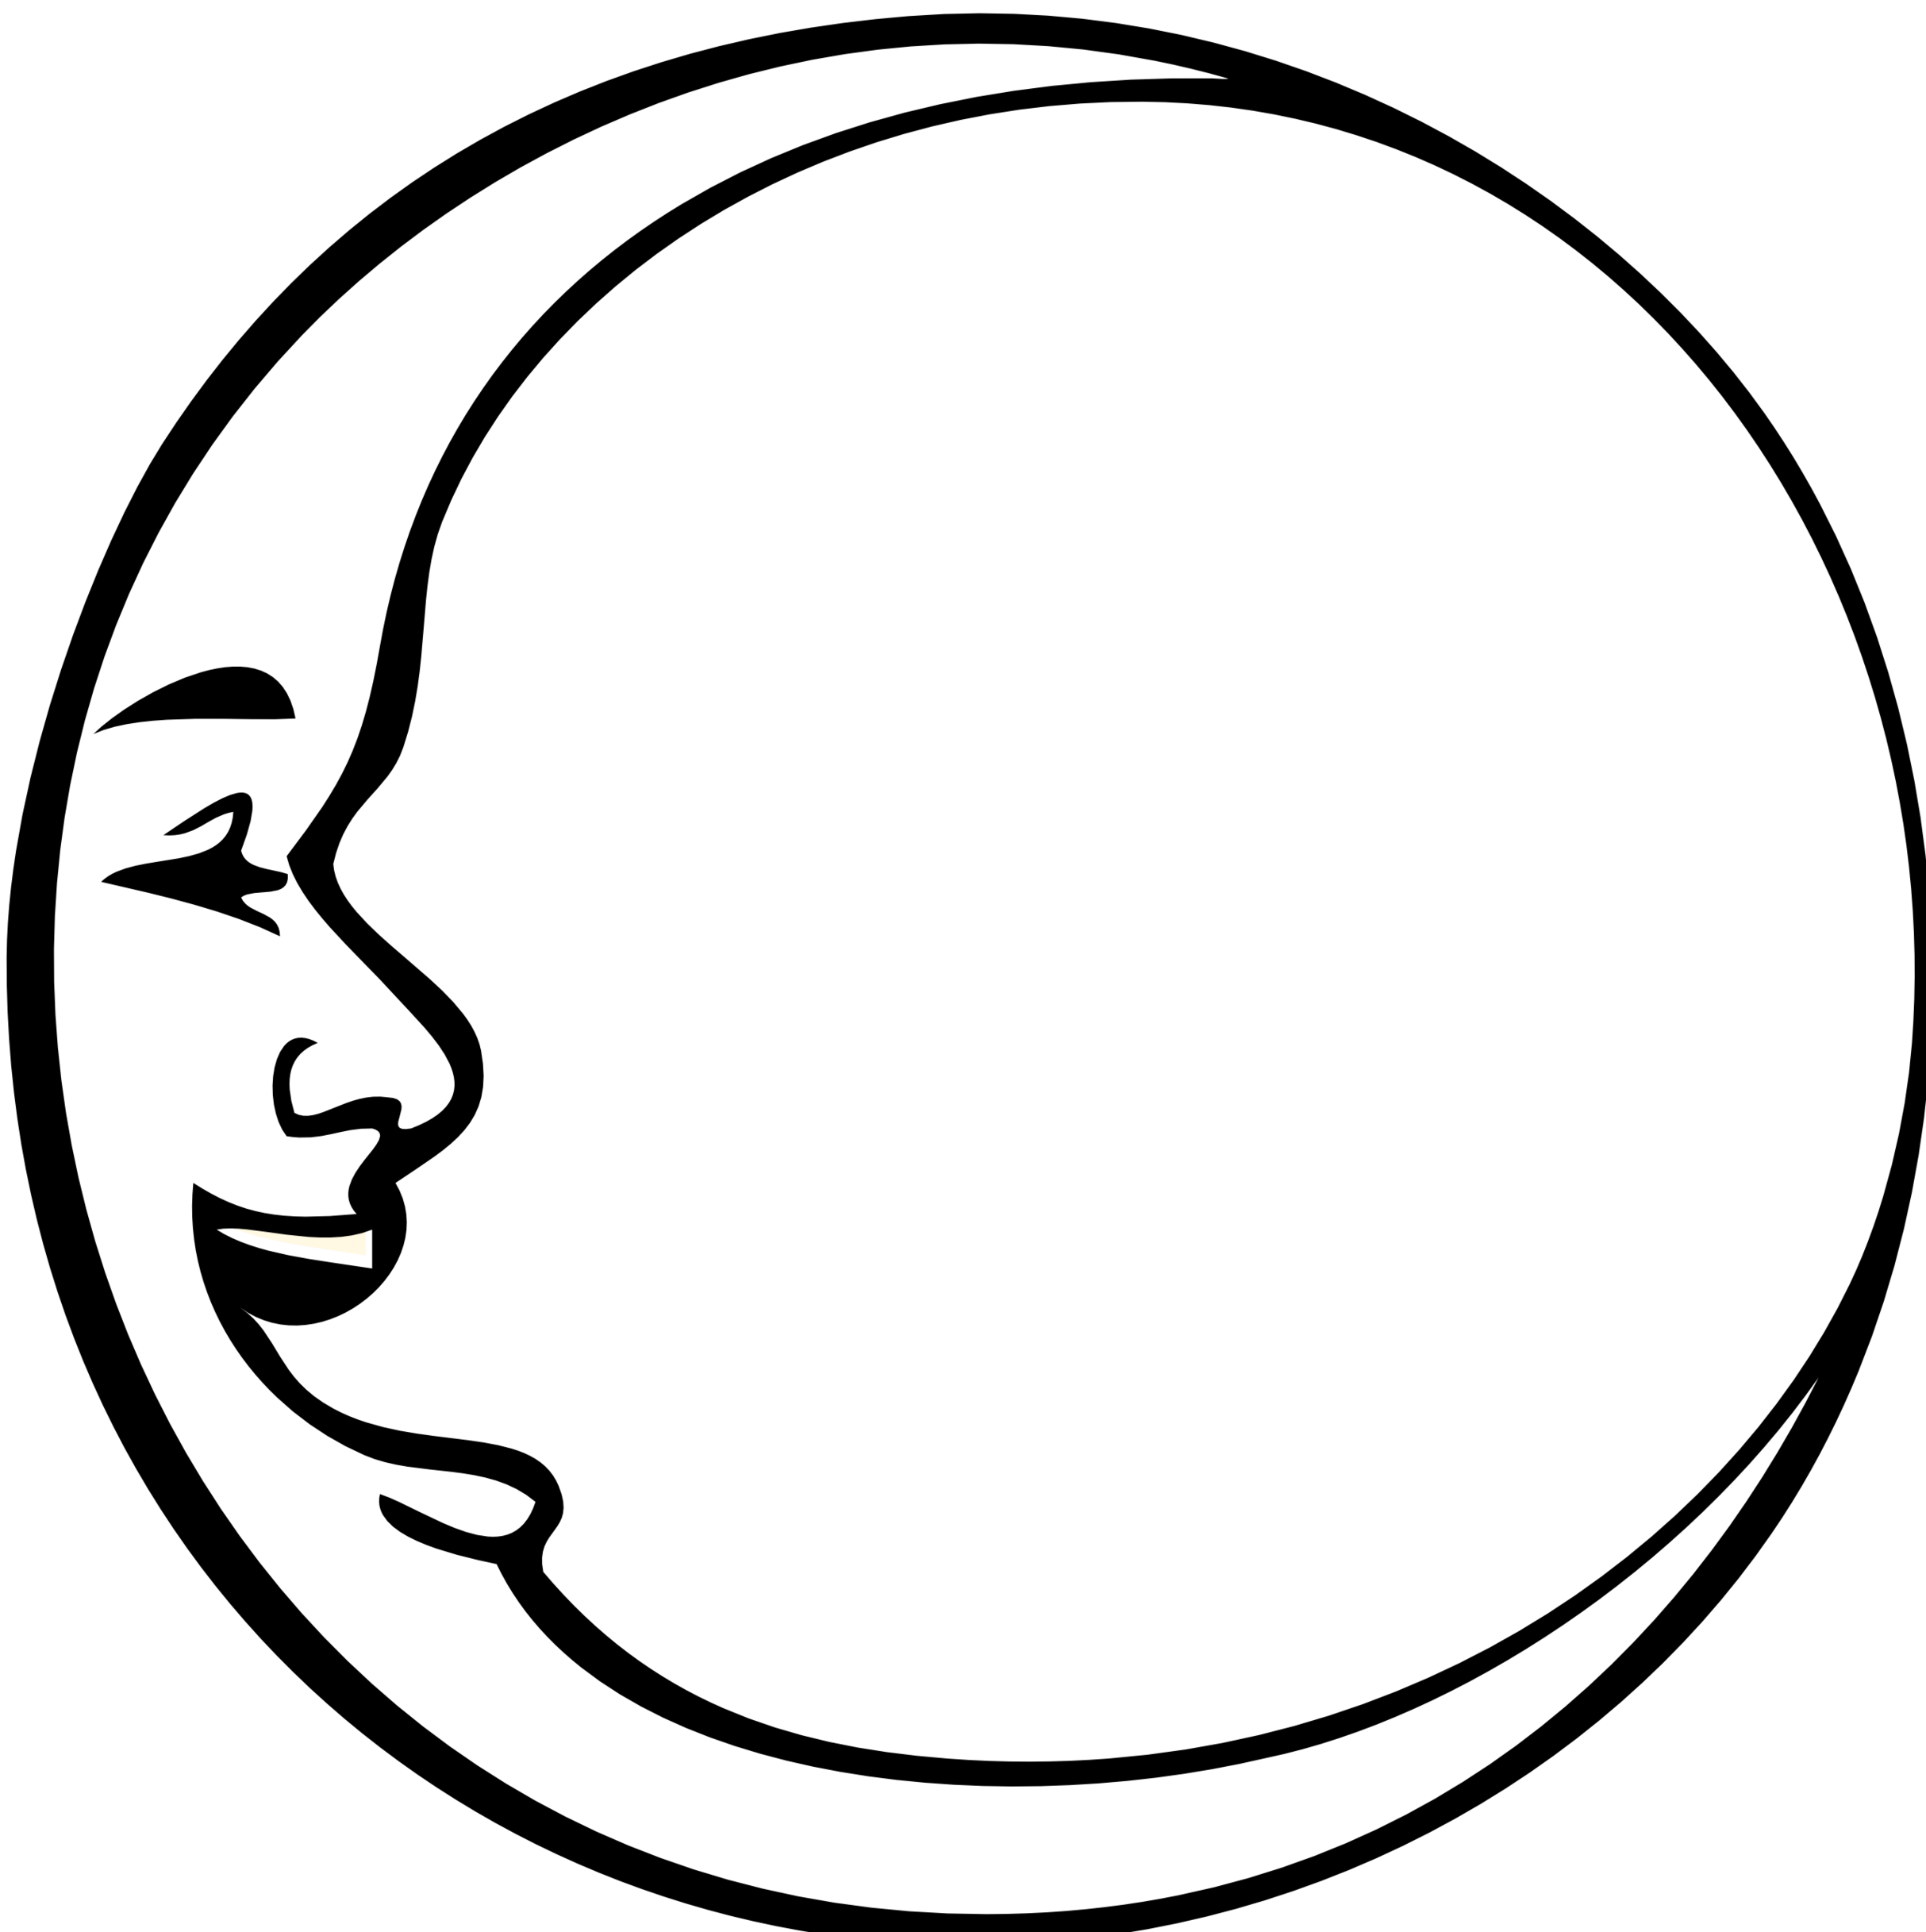 Images For Gt Triple Moon Symbol Outline Clipart